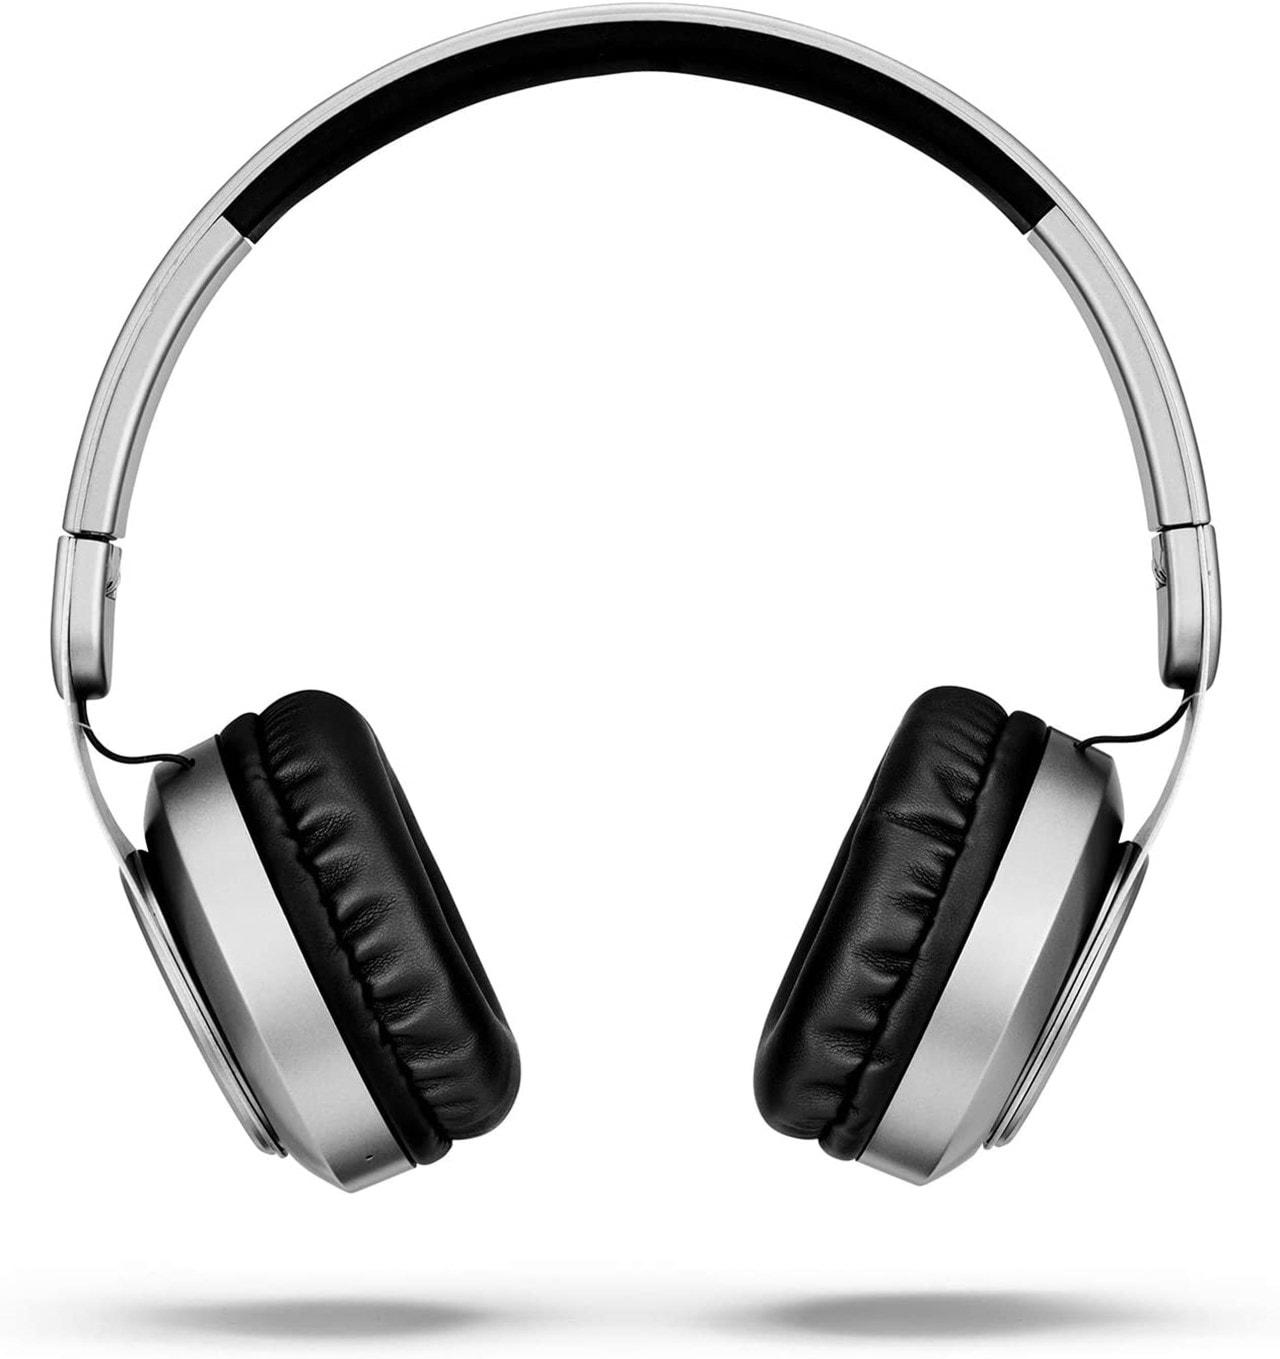 Mixx Audio JX1 Space Grey On Ear Bluetooth Headphones - 2